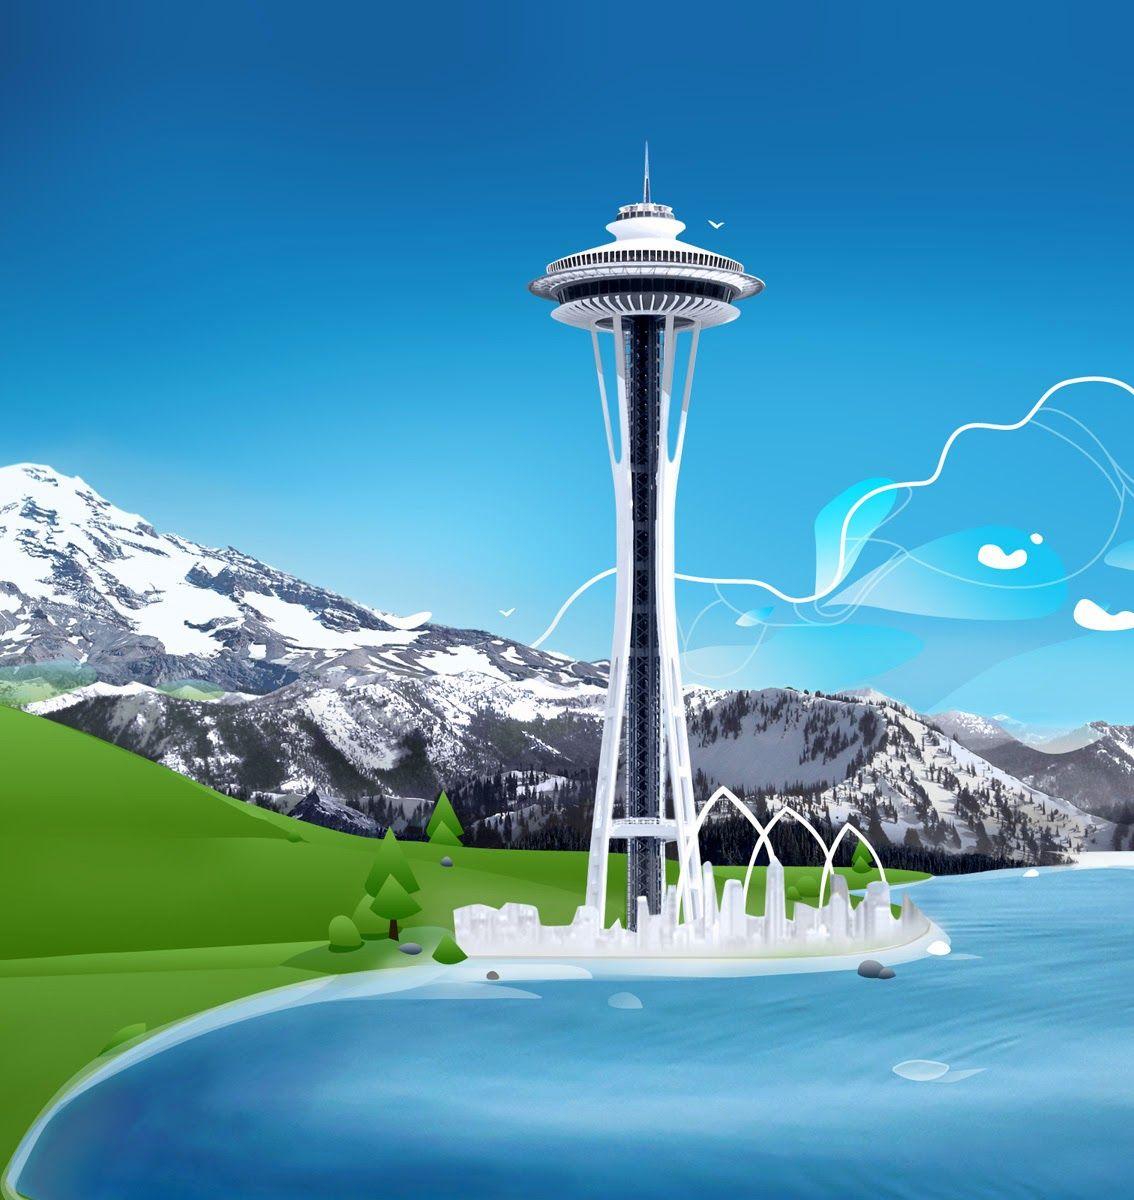 Wallpaper download live - Free Windows 8 Hd Live Wallpaper Download For Android Android